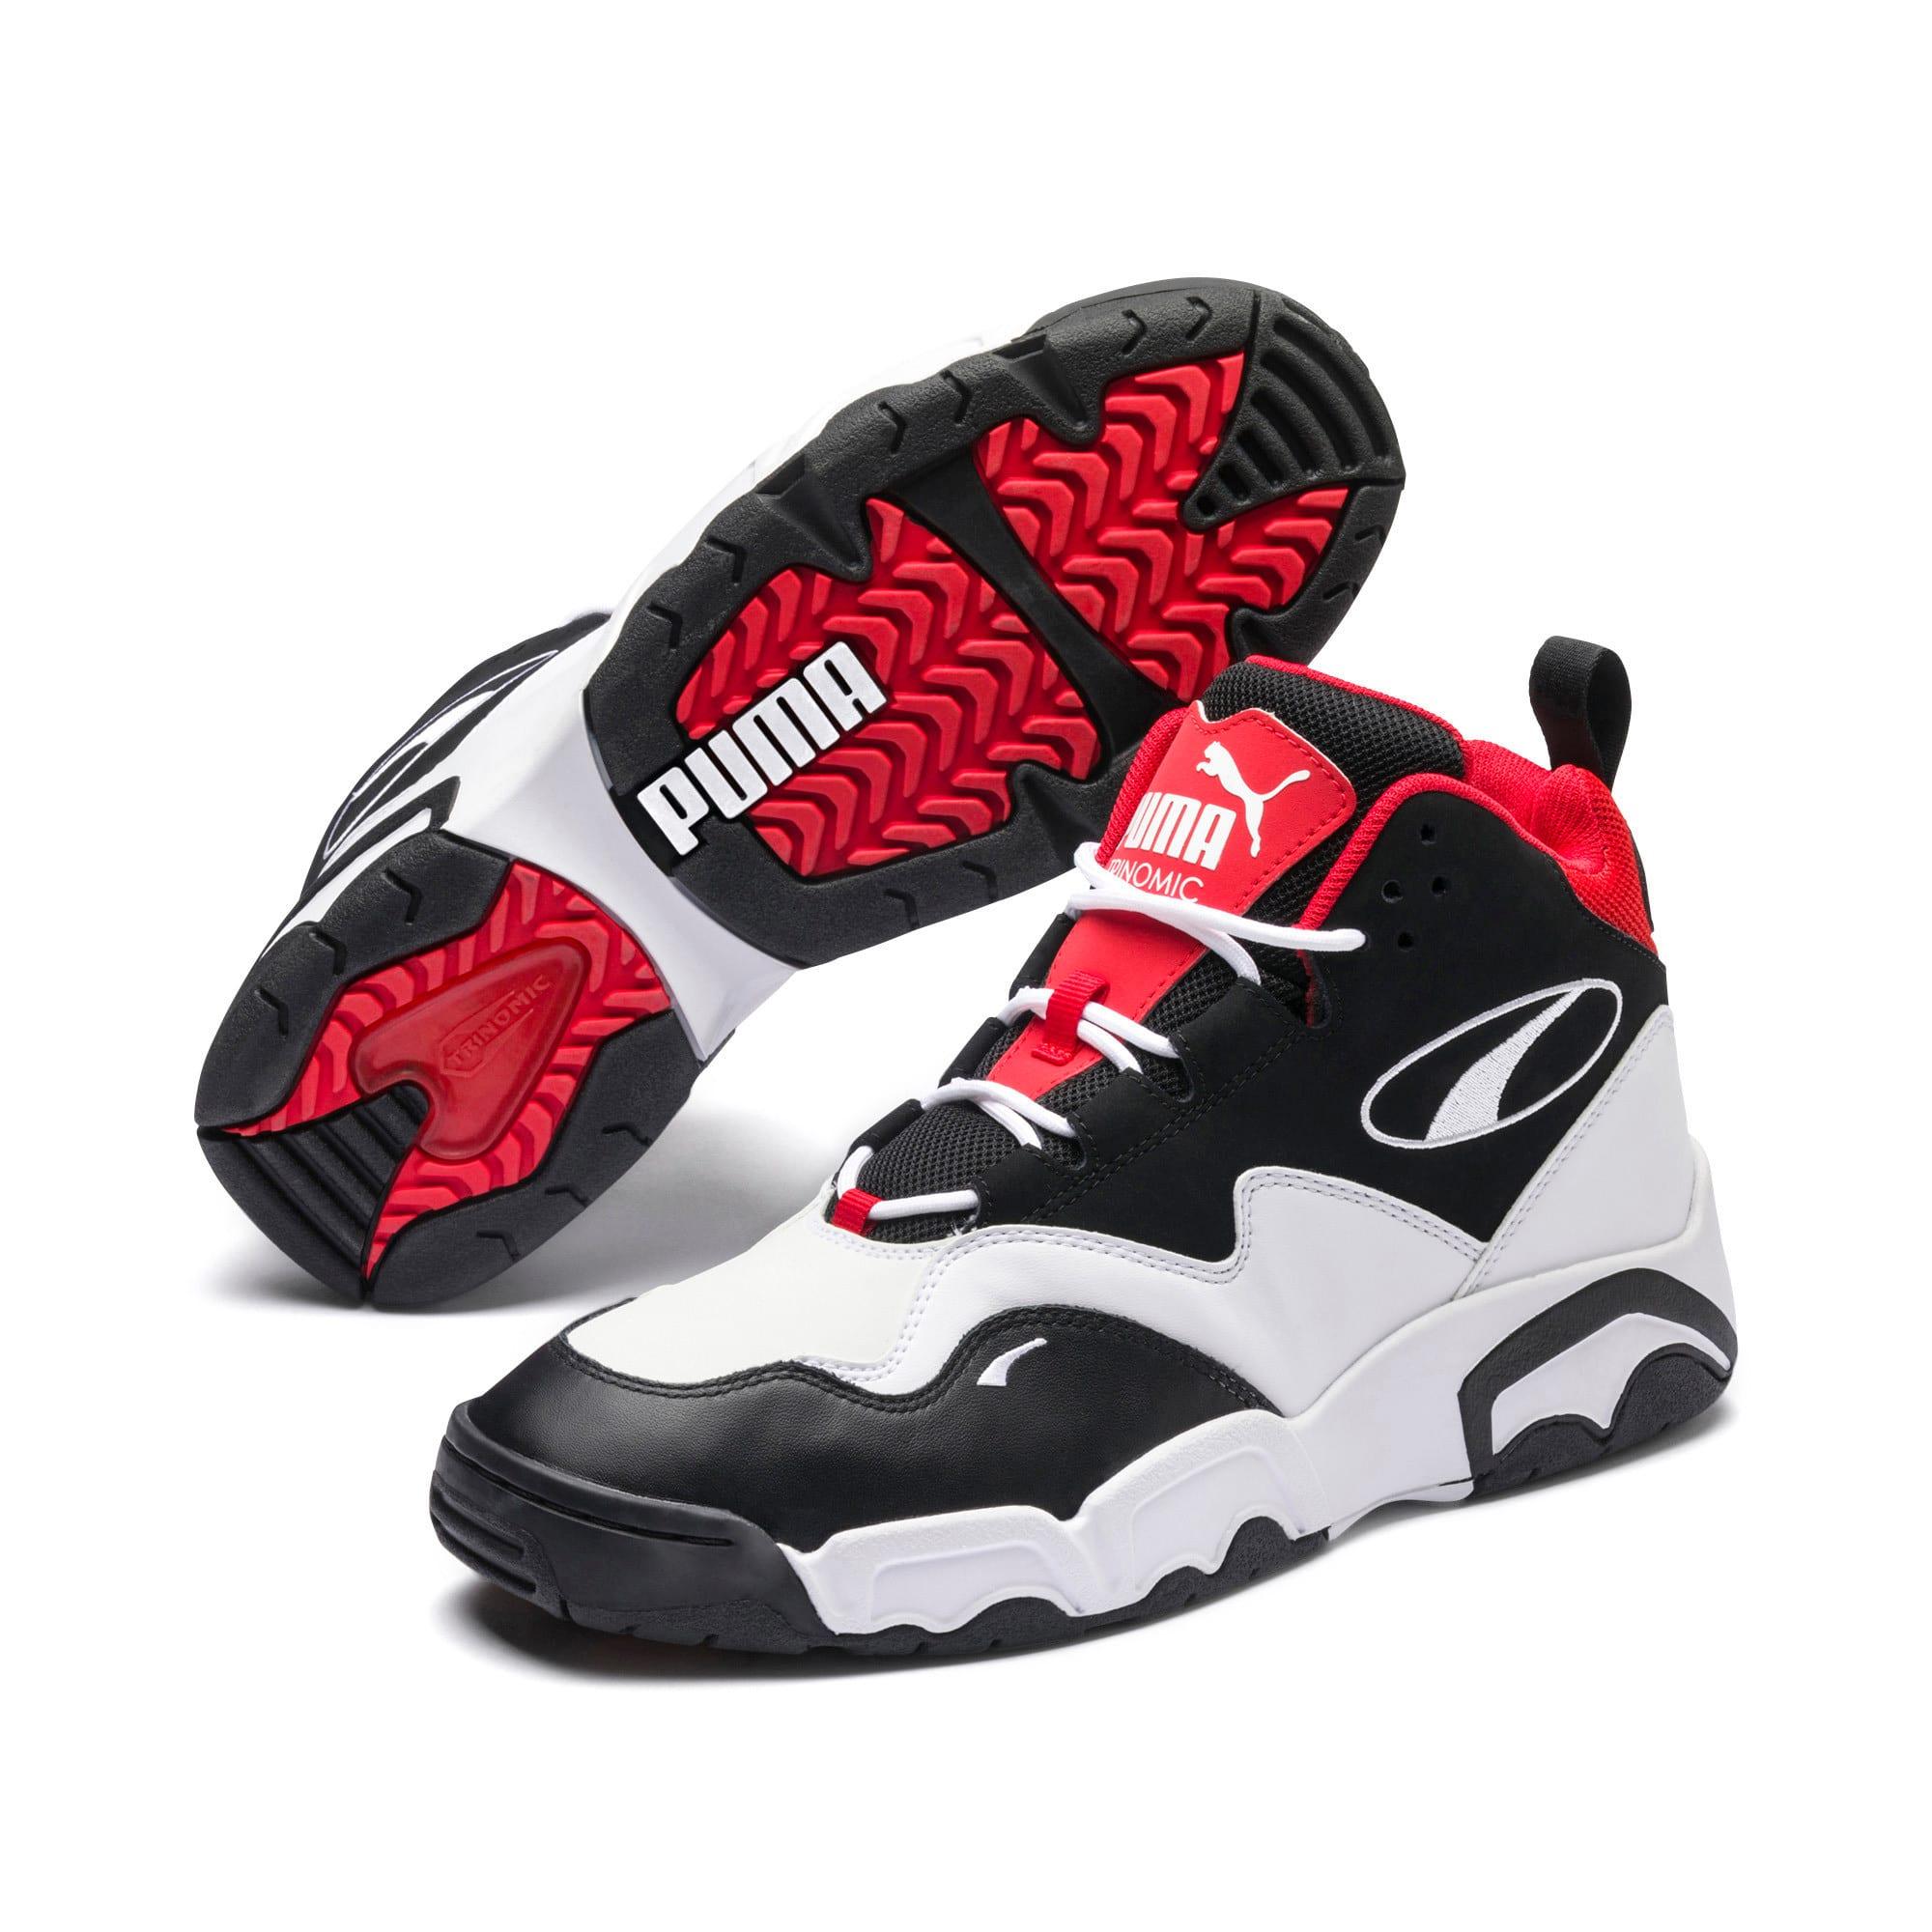 Miniatura 2 de Zapatos deportivos Source de caña media, Black- White-High Risk Red, mediano